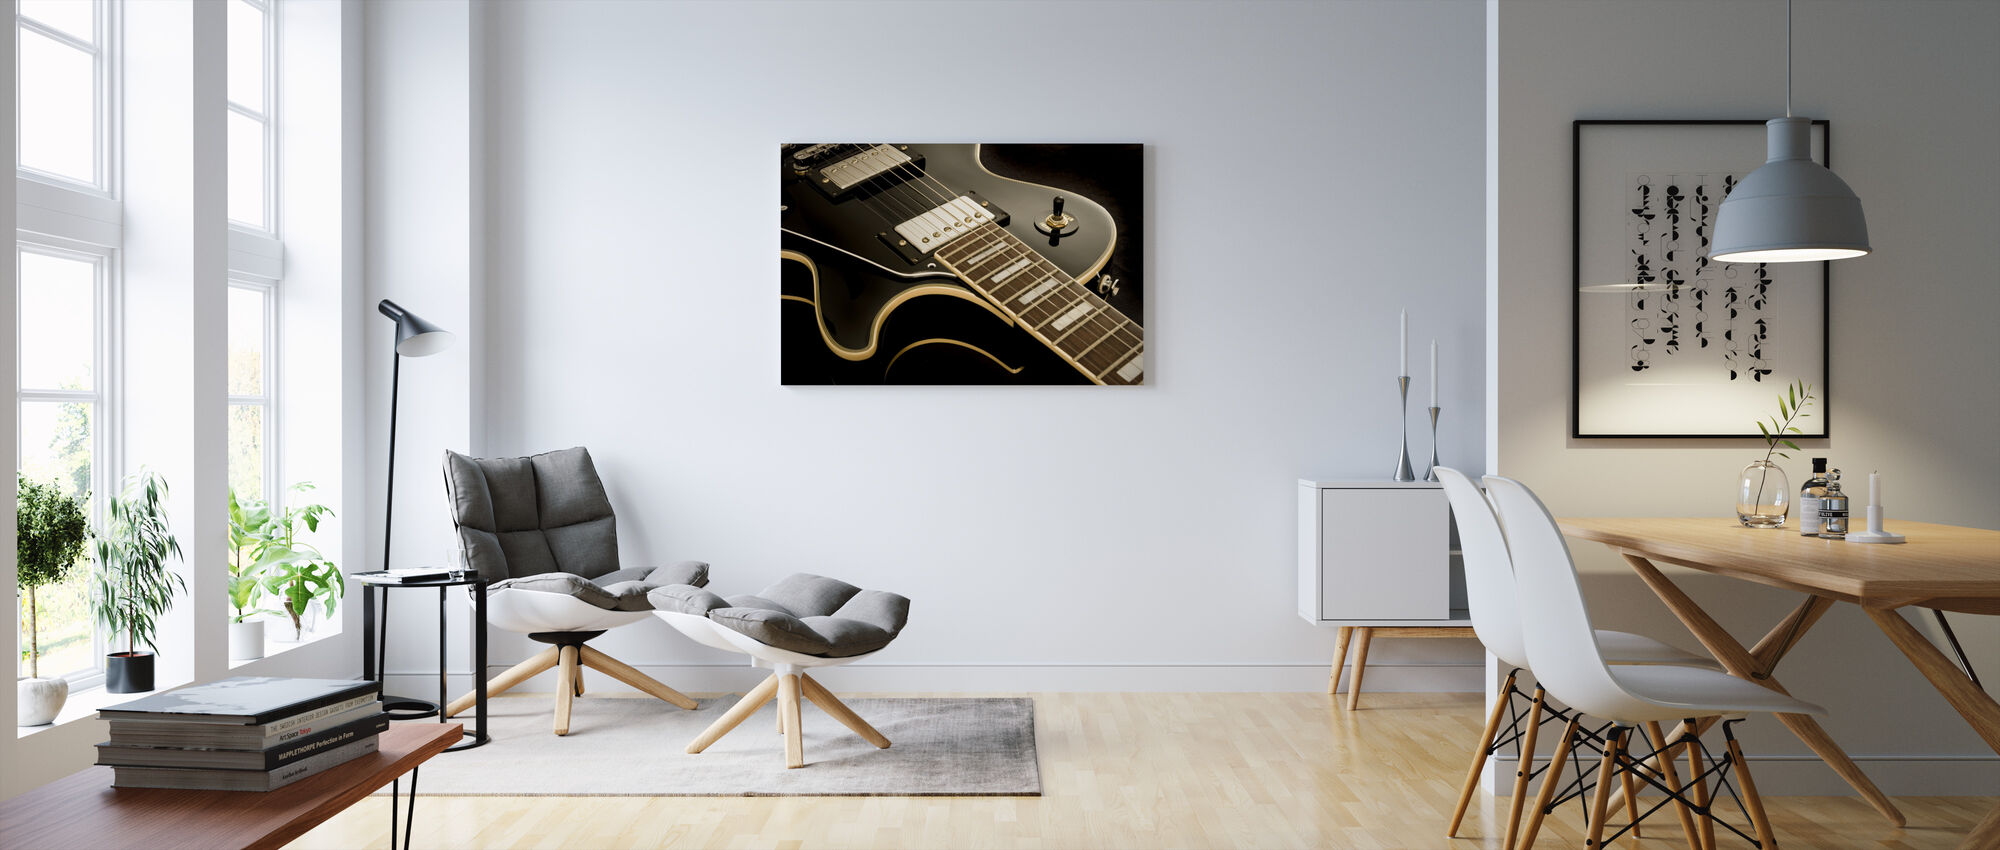 Vintage Guitar - Canvas print - Living Room